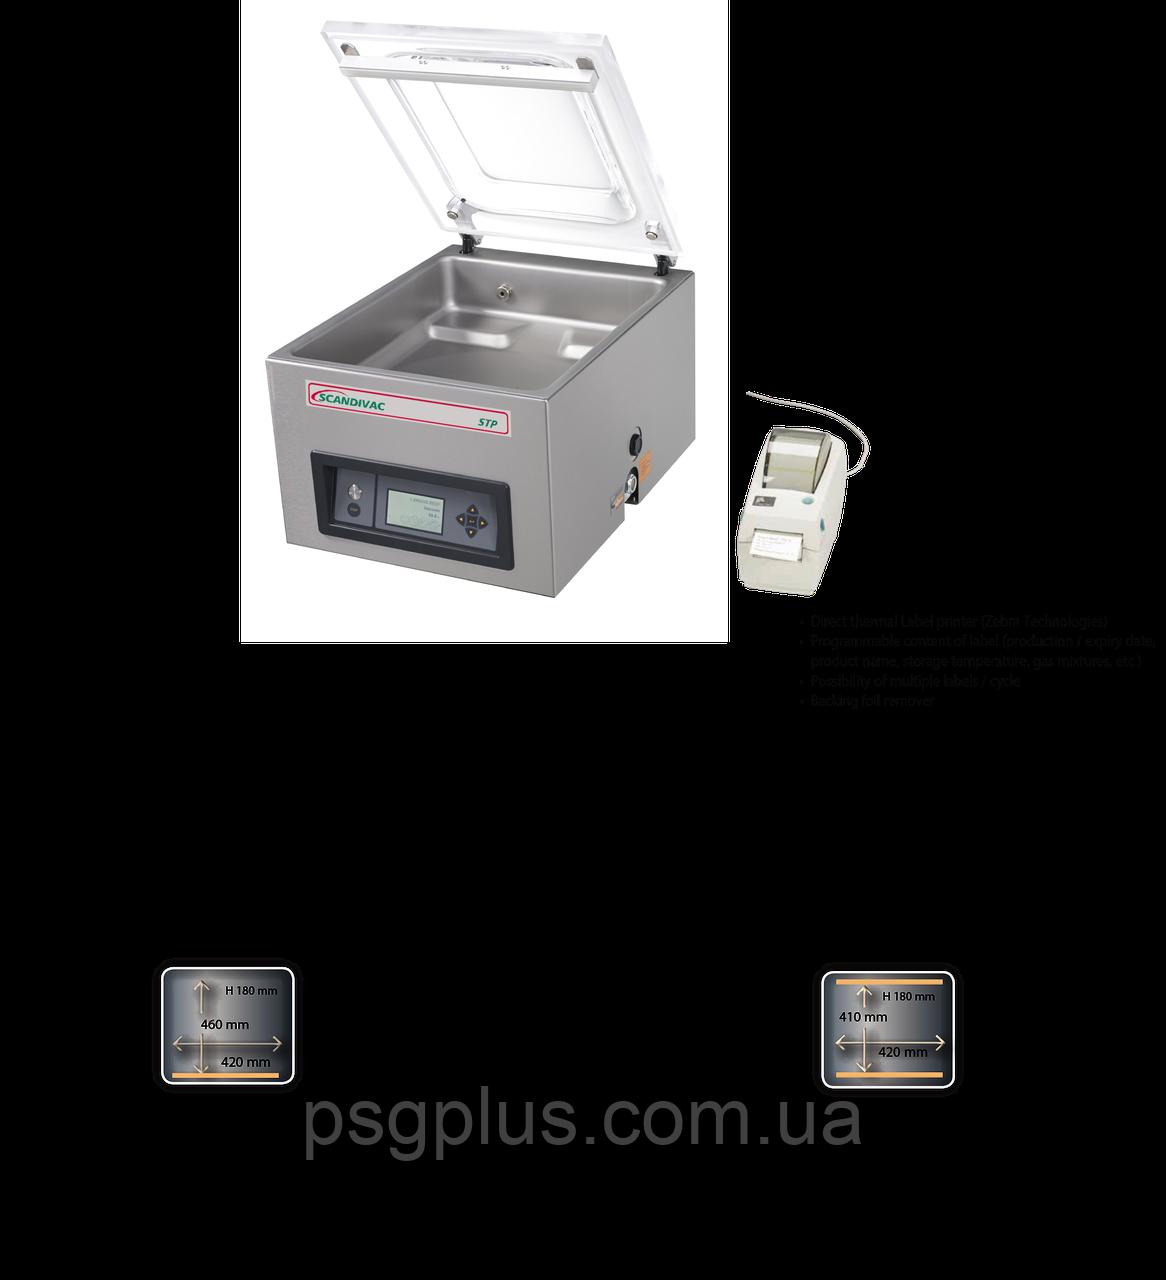 Однокамерний вакуумний пакувальник SCANDIVAC STP 21-42d